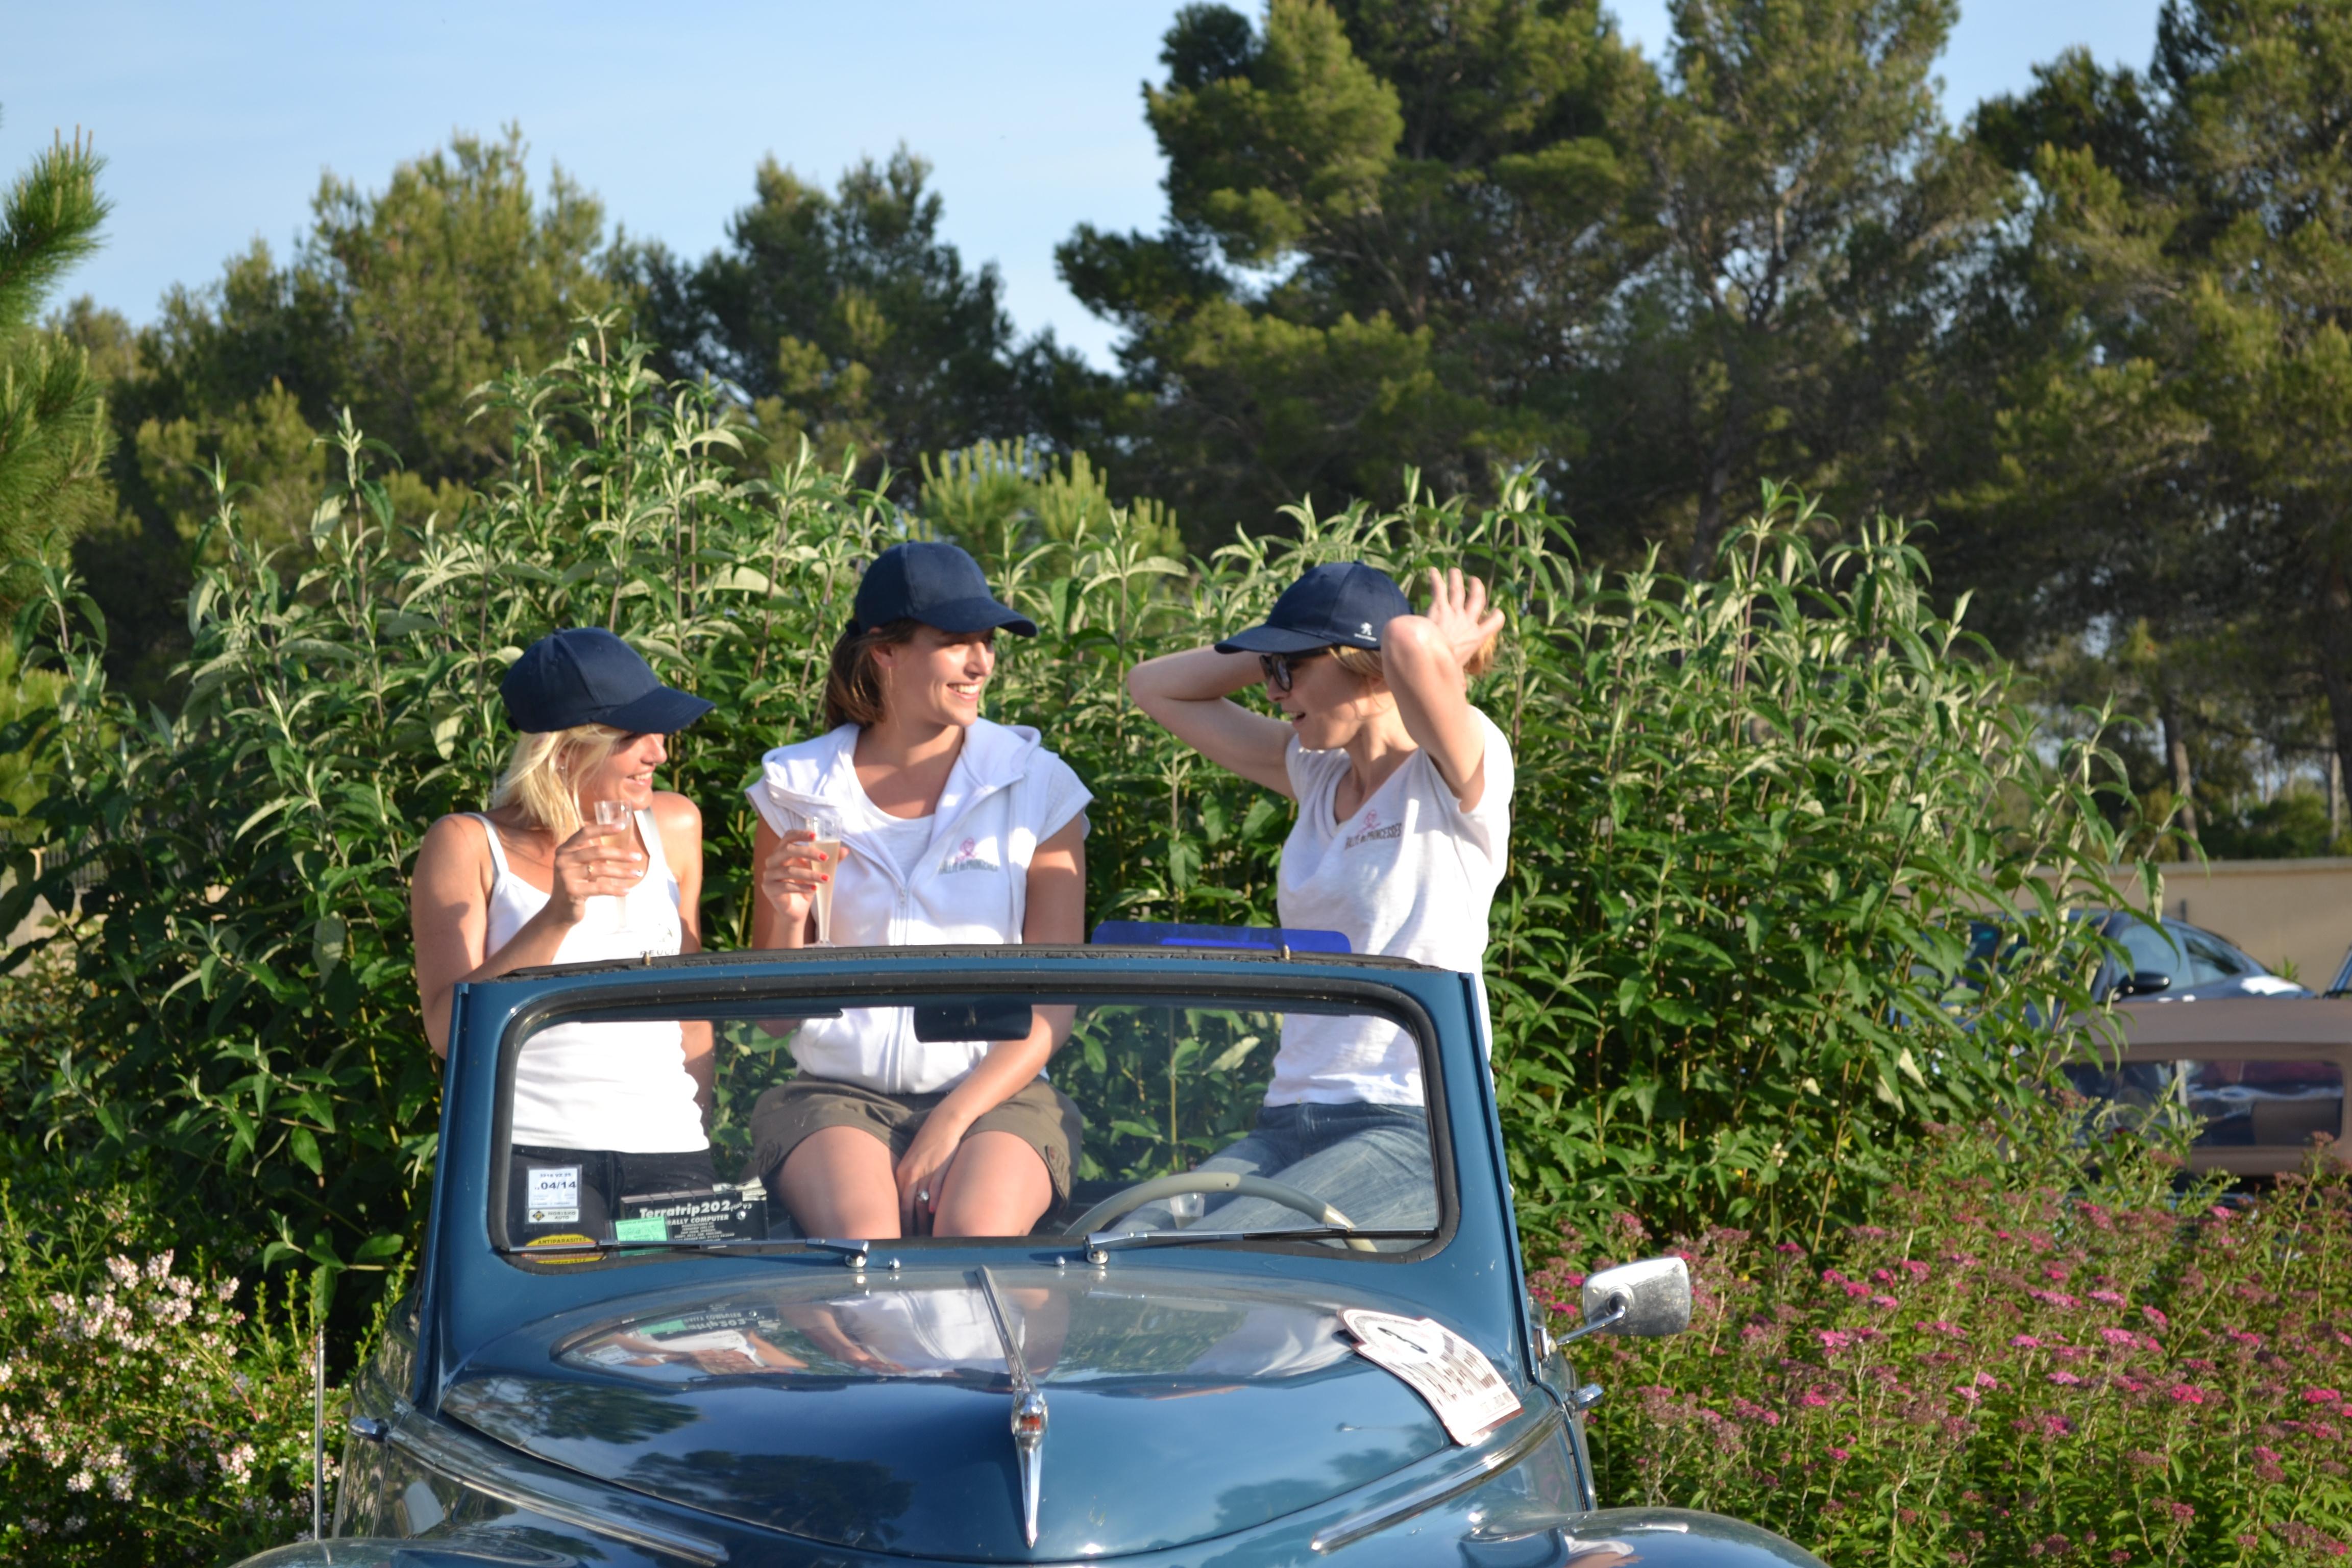 Julie Gayet, Rallye des Princesses, régularité, stars, Monaco